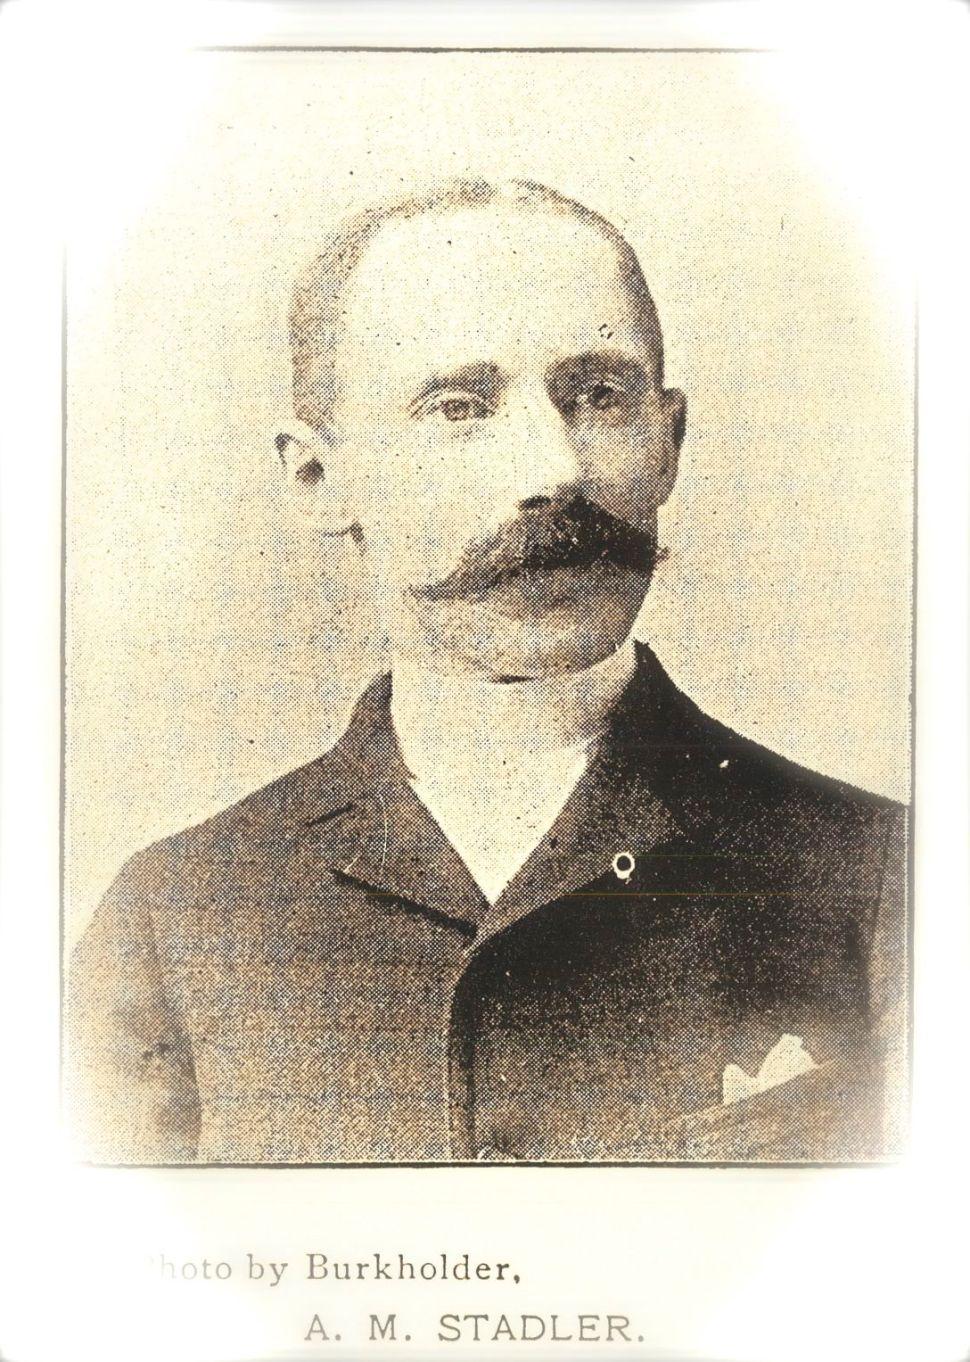 Aaron M. Stadler, Mount Vernon, Ohio, clothier from 1877 to 1905. The Republican, 1896.